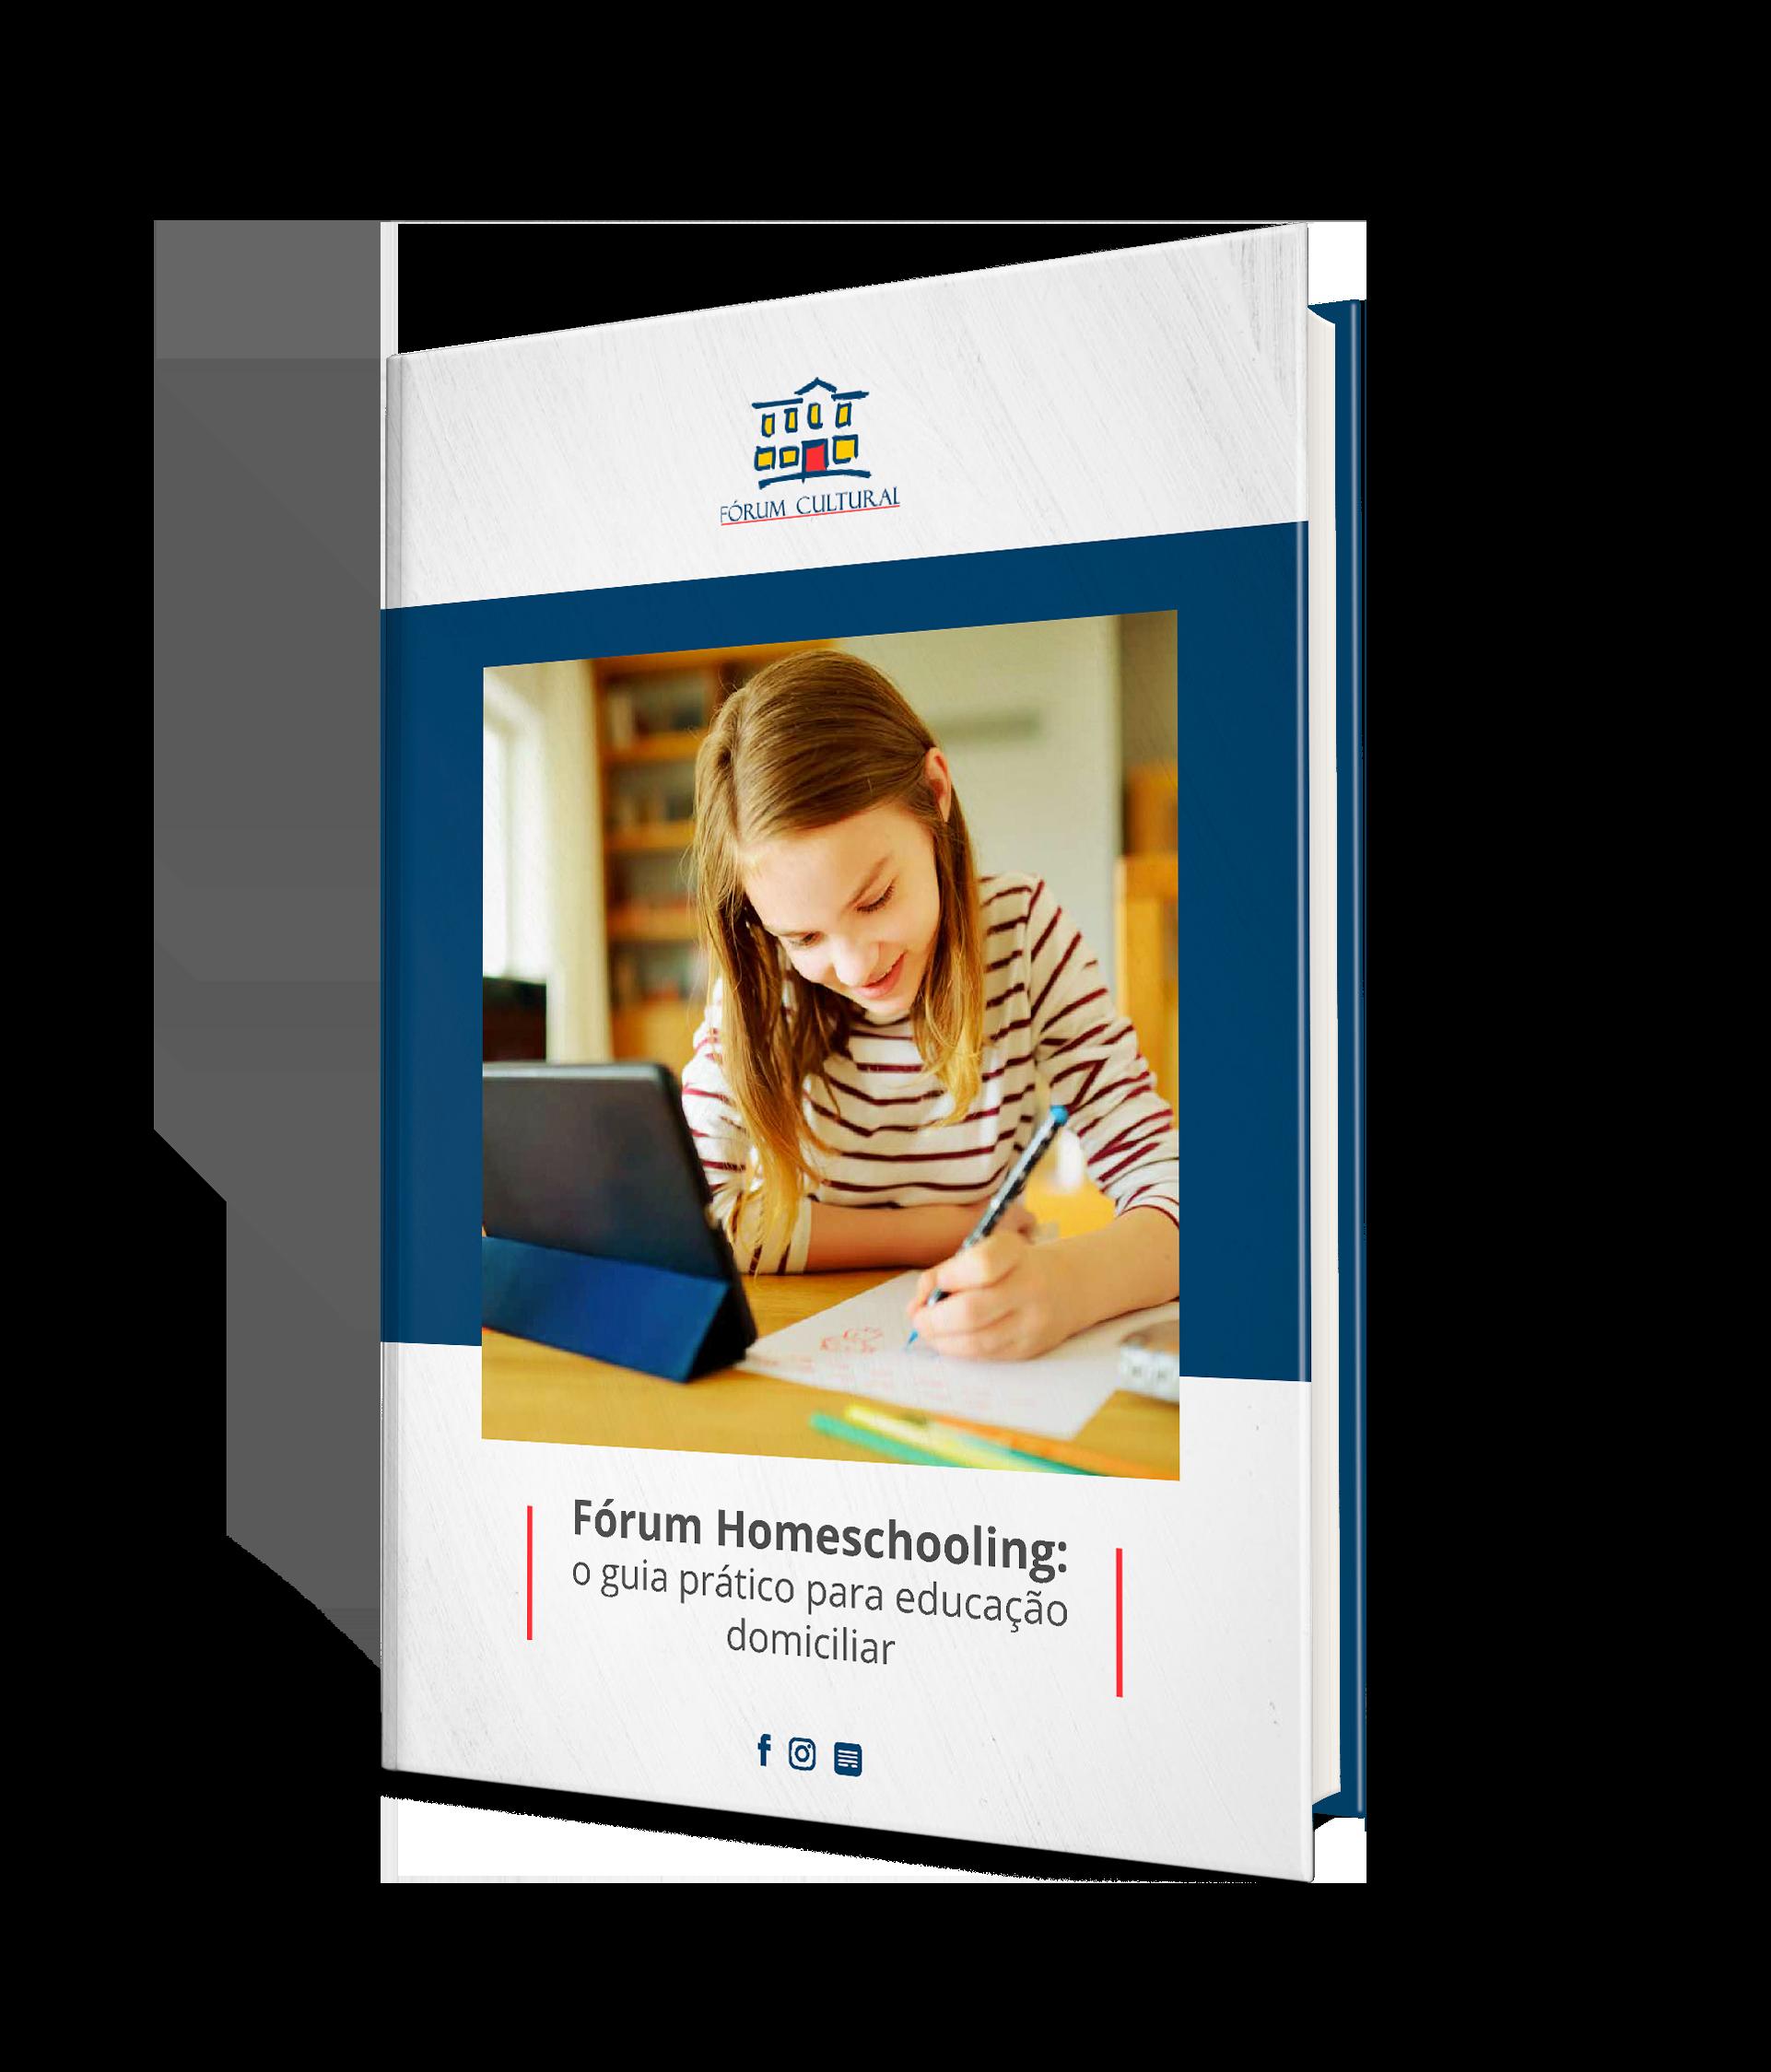 Mockup_Forum Homeschooling